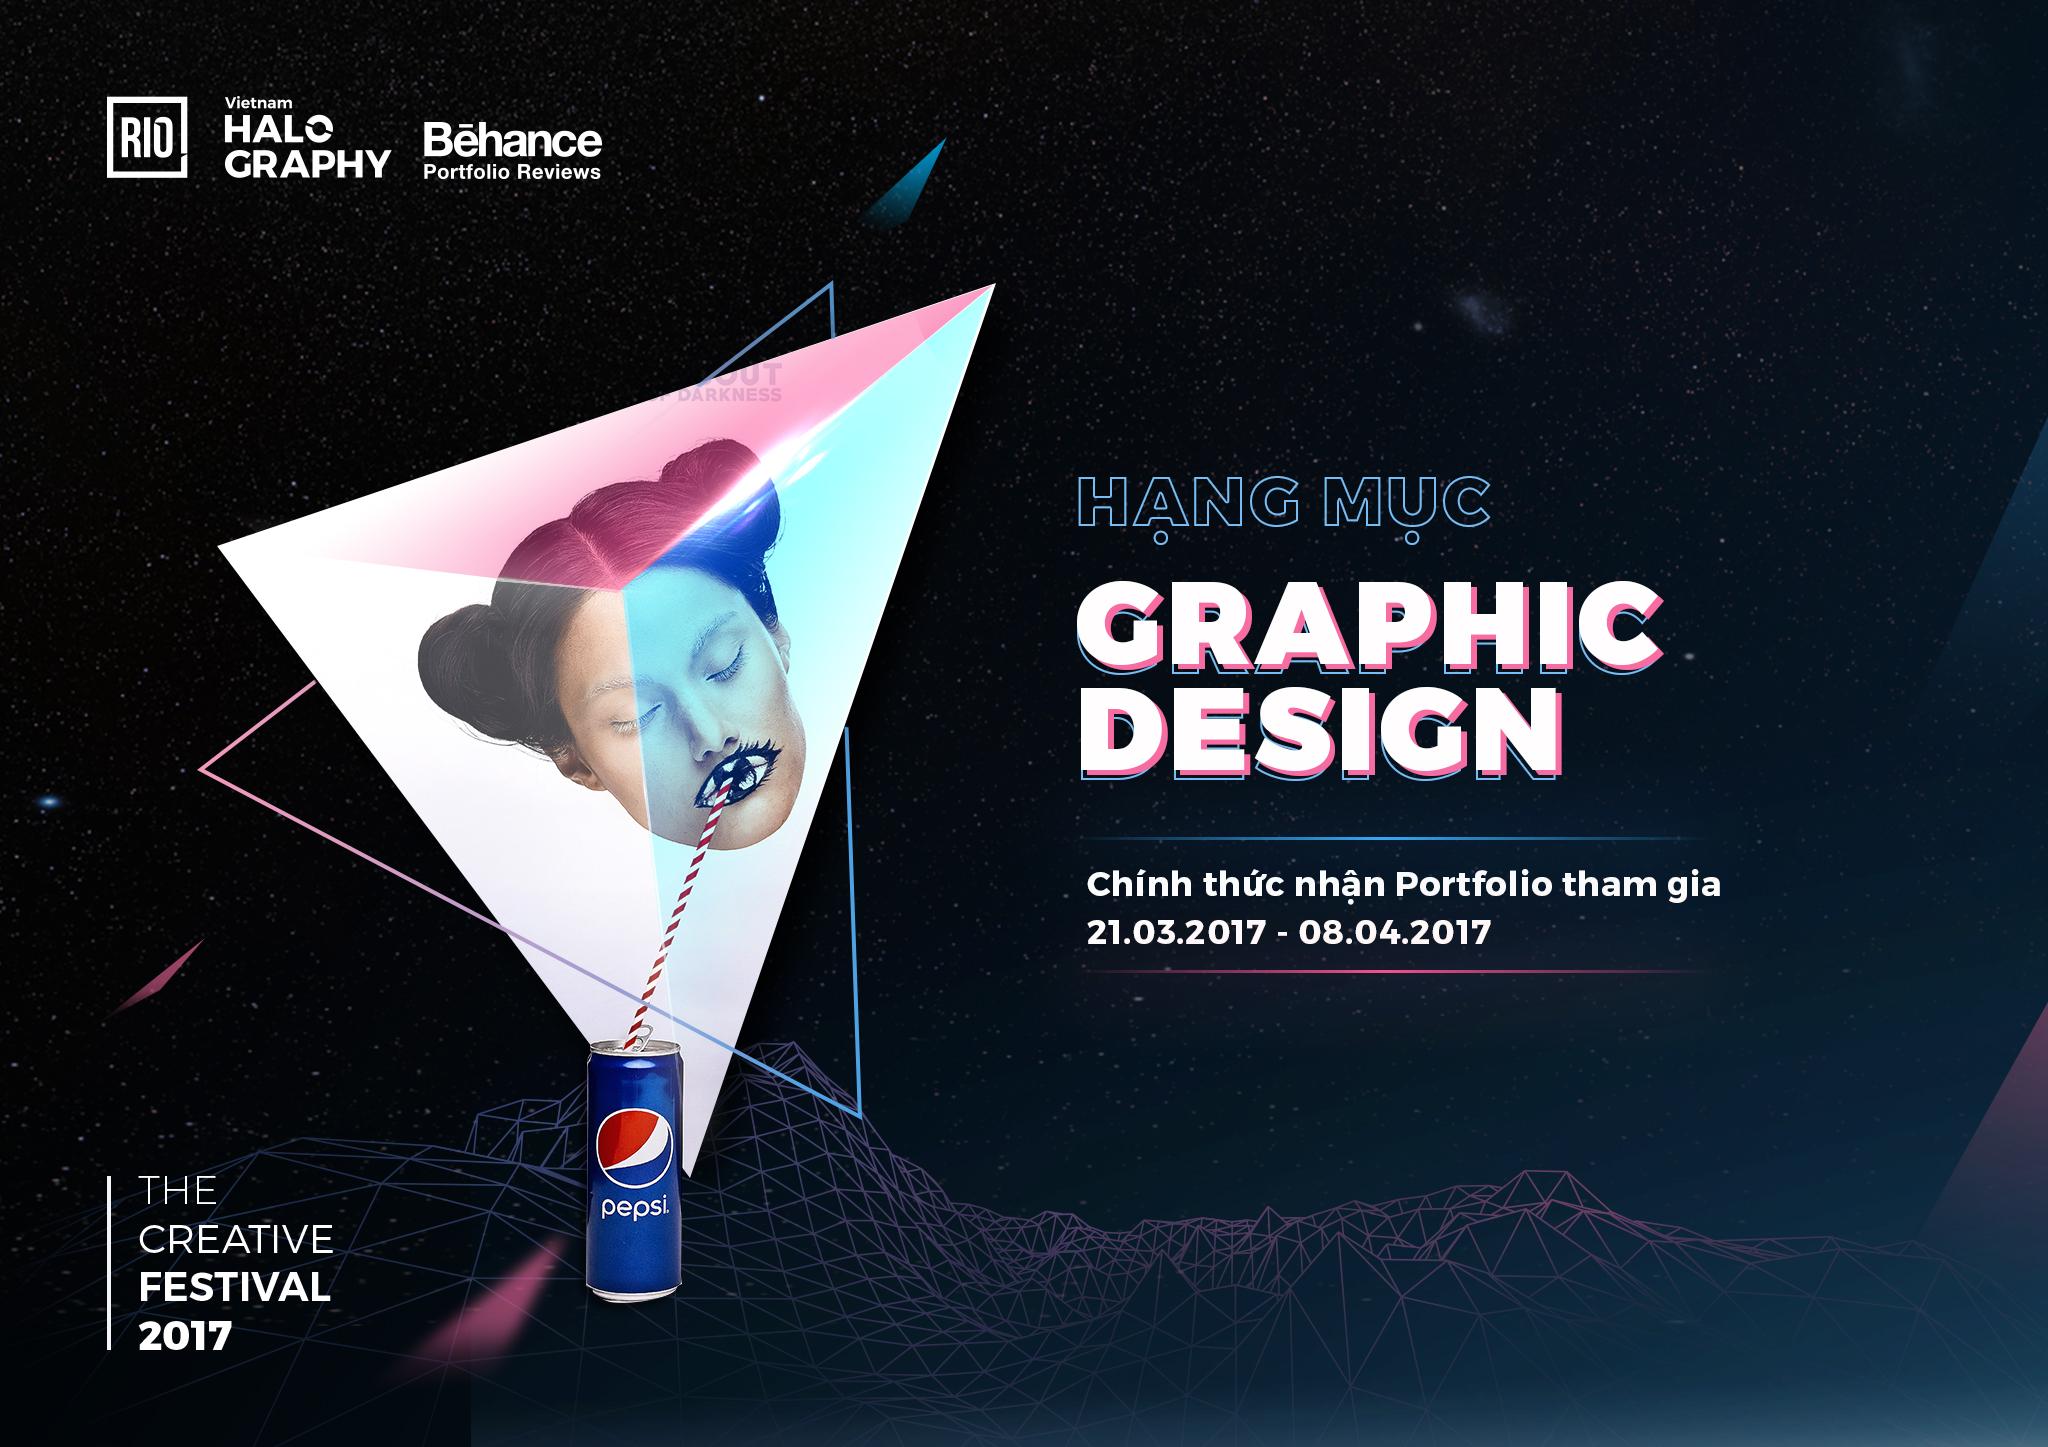 Halo_graphic design (1)